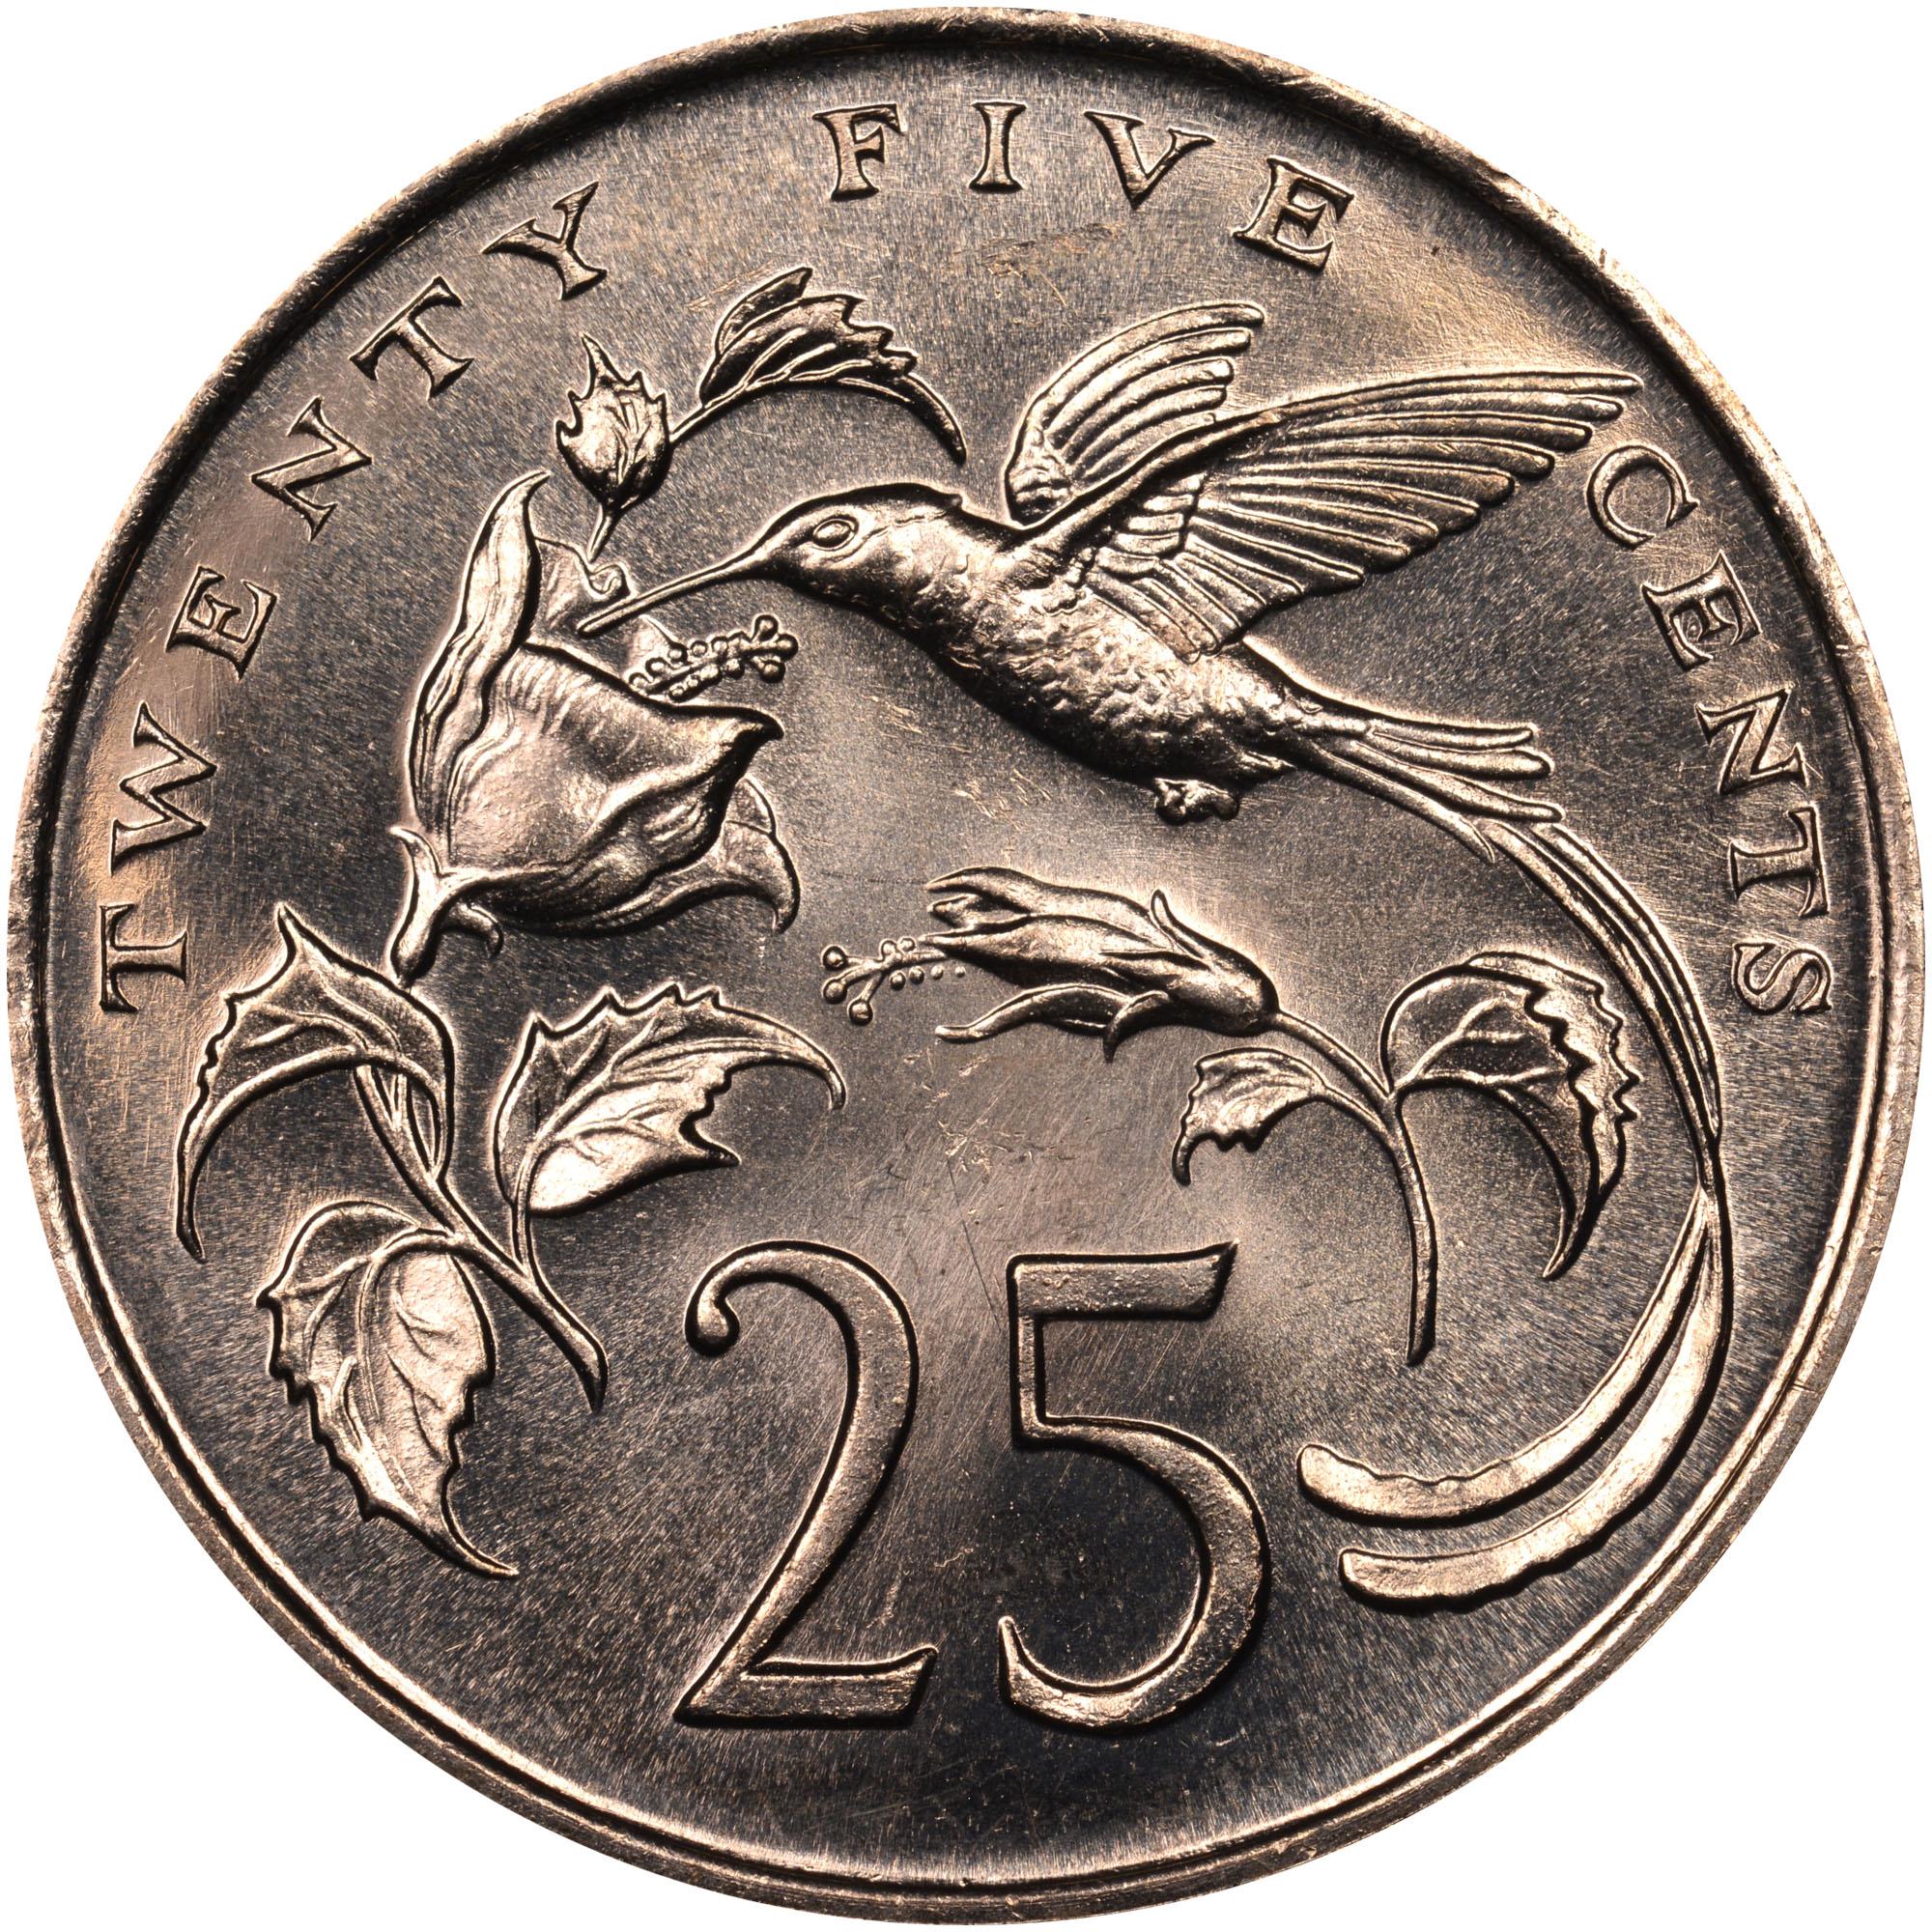 Jamaica 25 Cents Km 49 Prices Amp Values